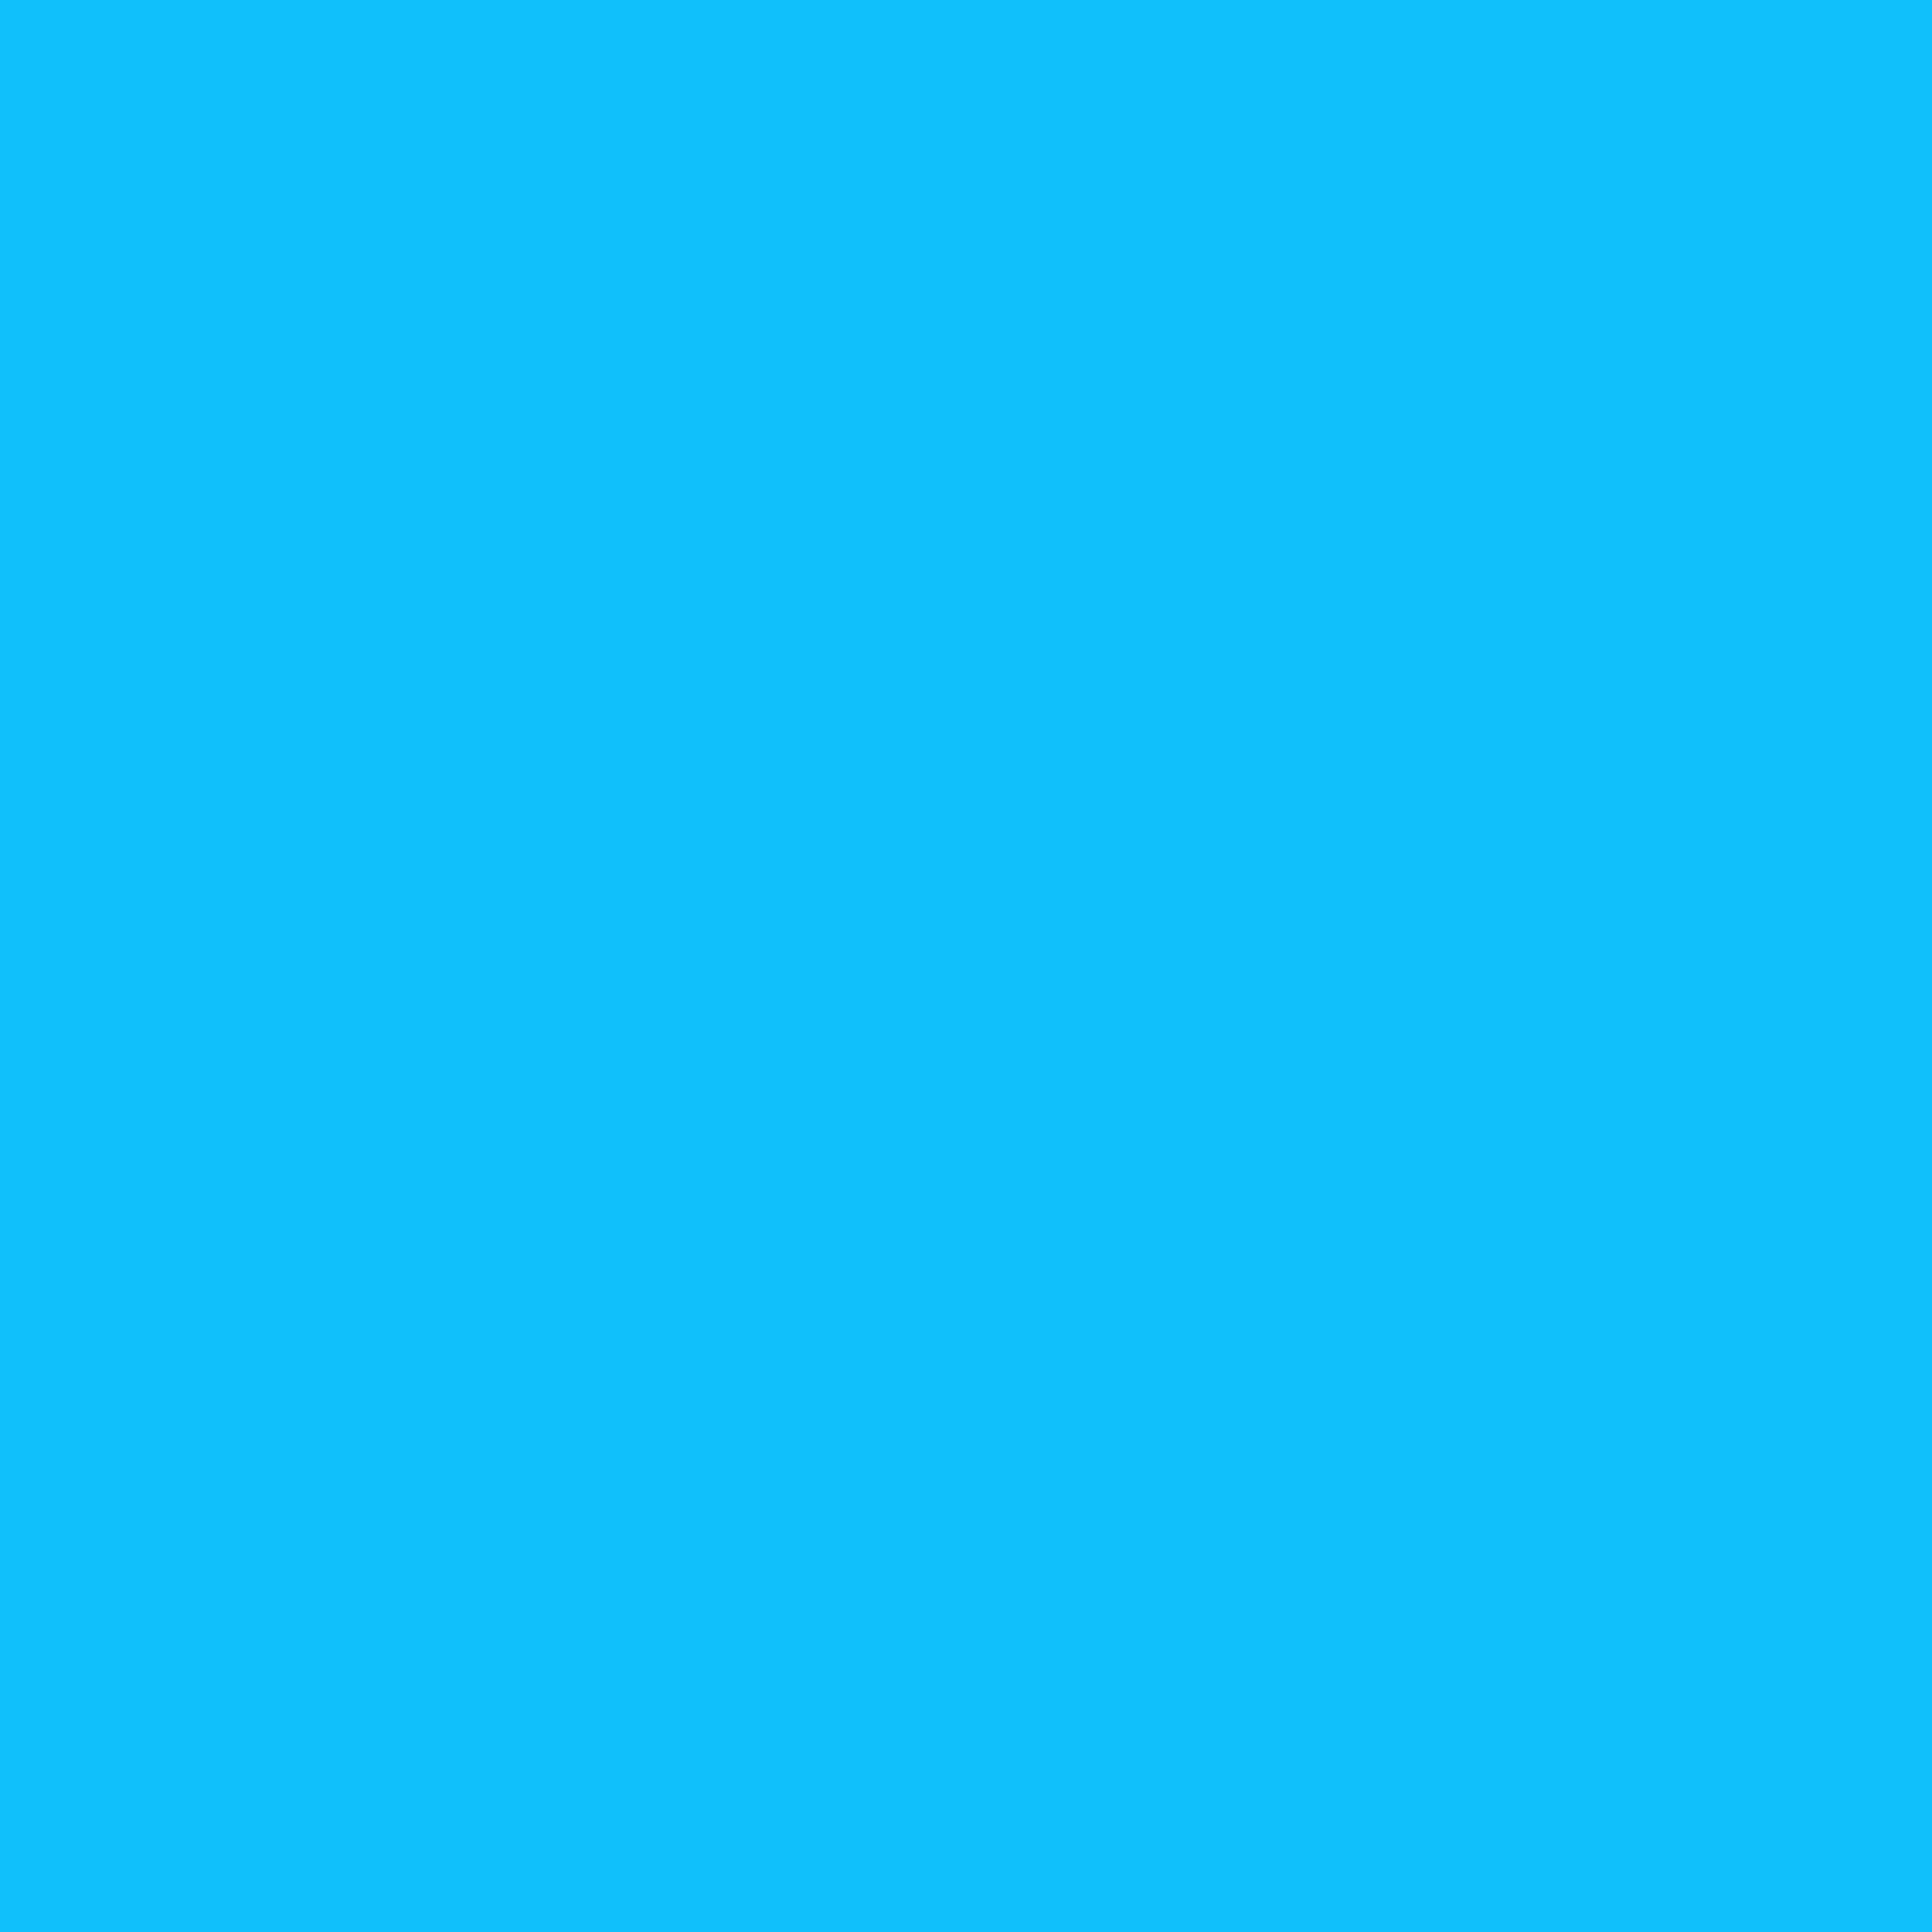 3600x3600 Spiro Disco Ball Solid Color Background